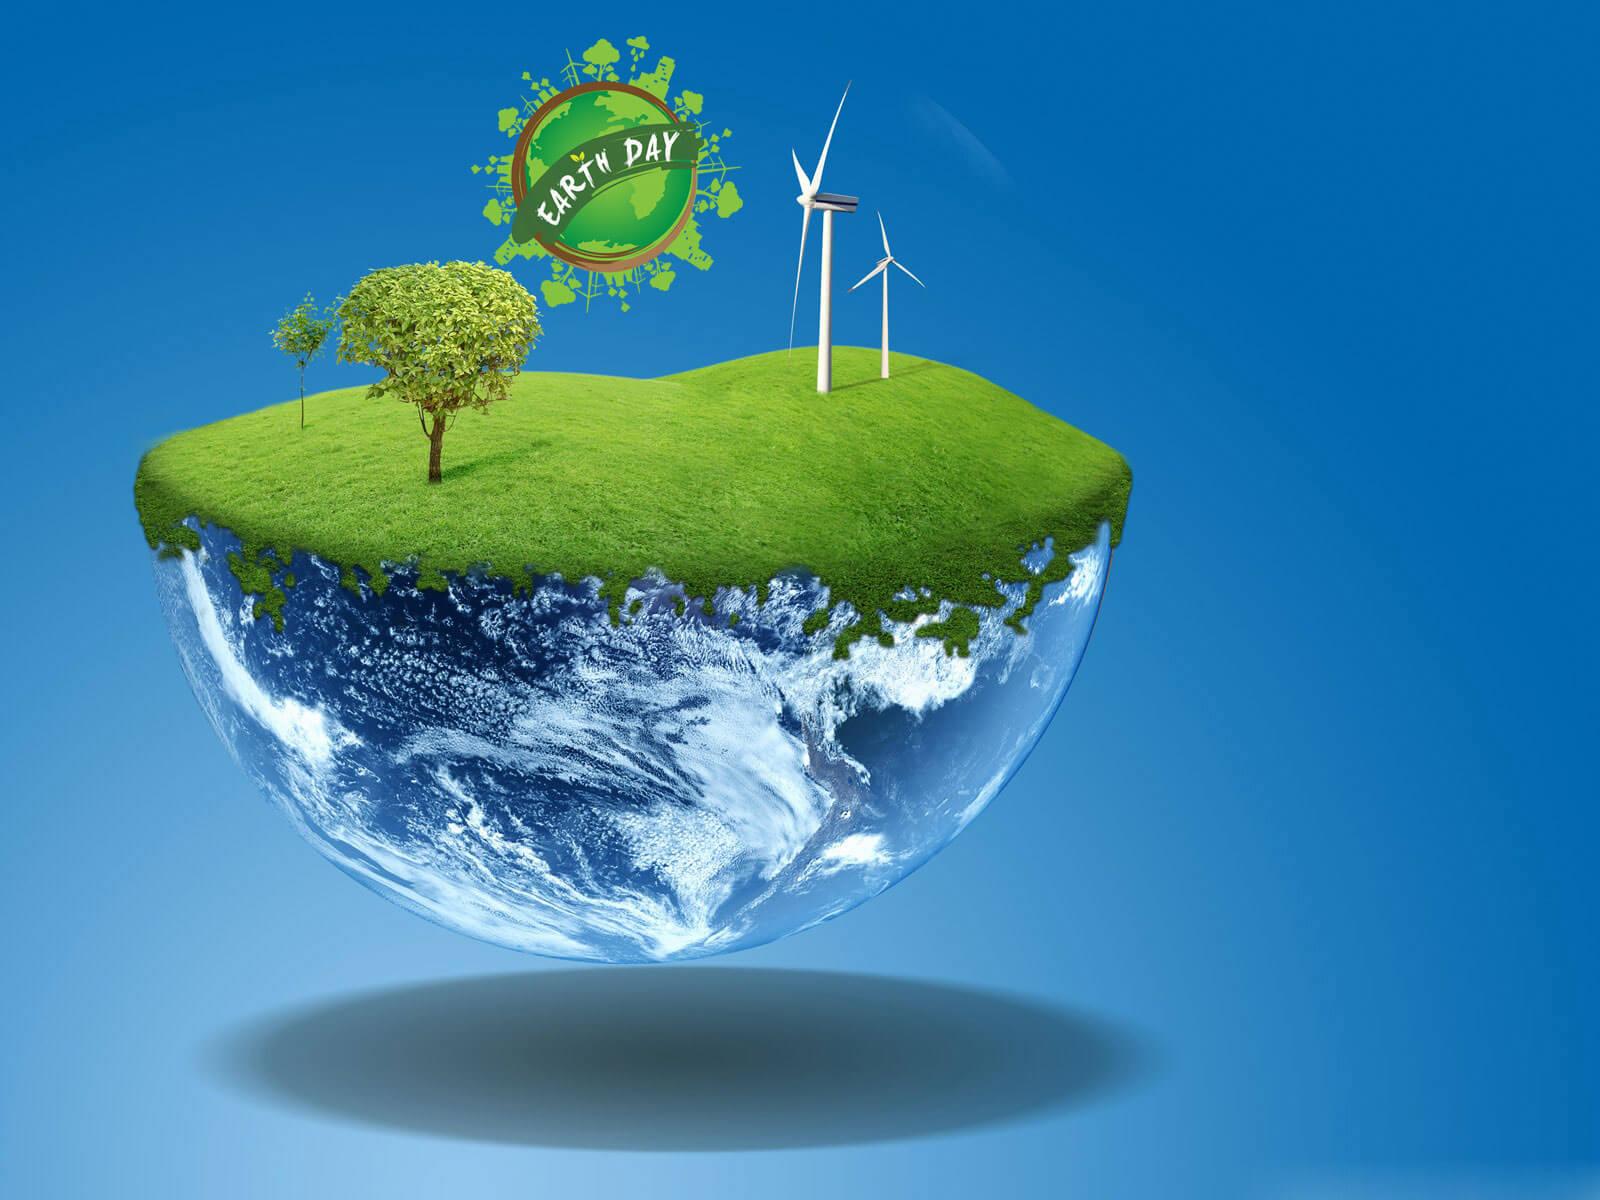 earth green day wallpaper - photo #28